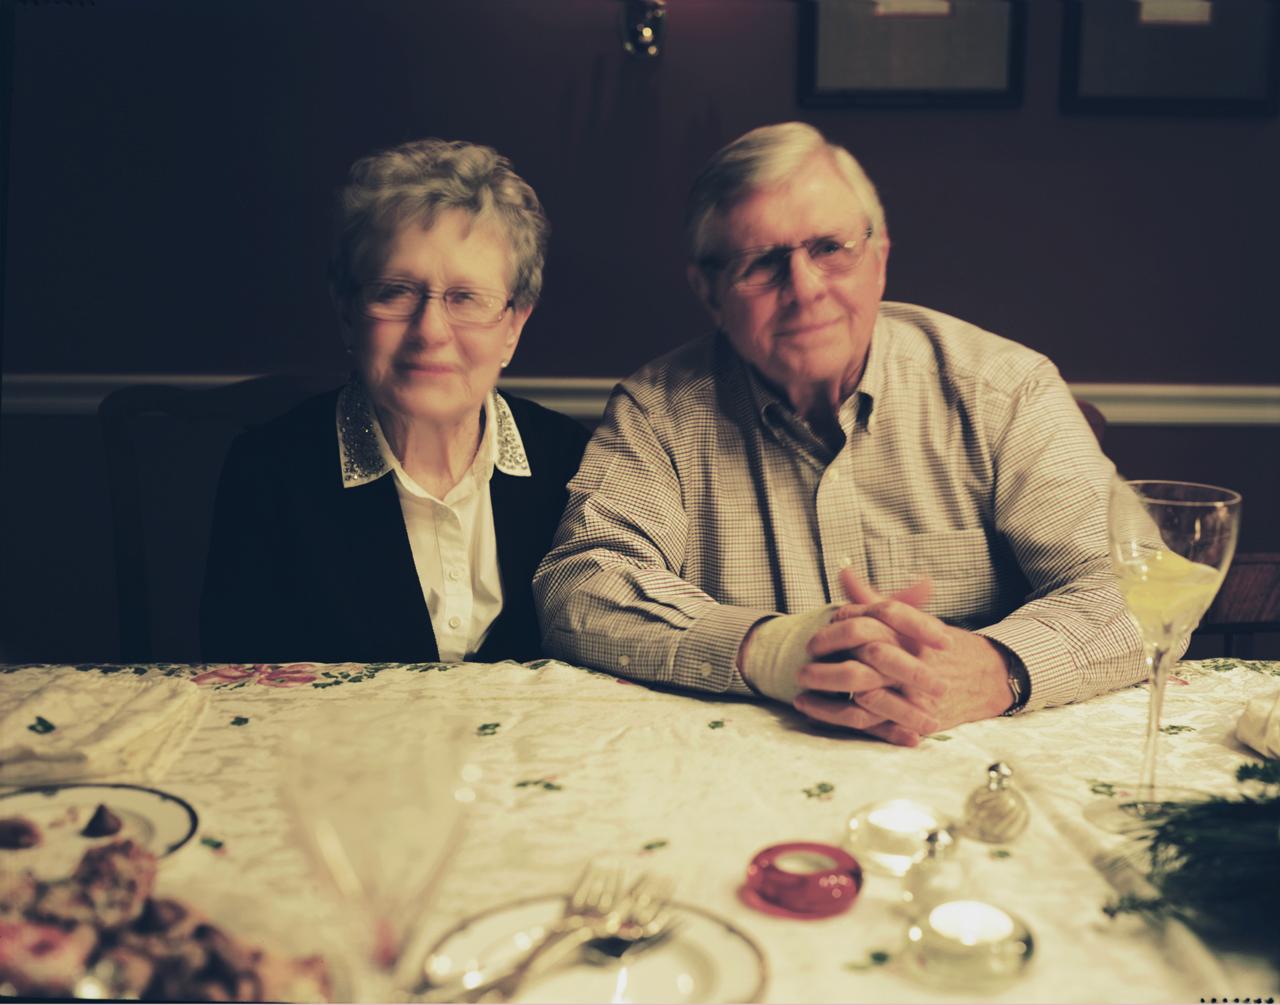 grandparentstogether.jpg